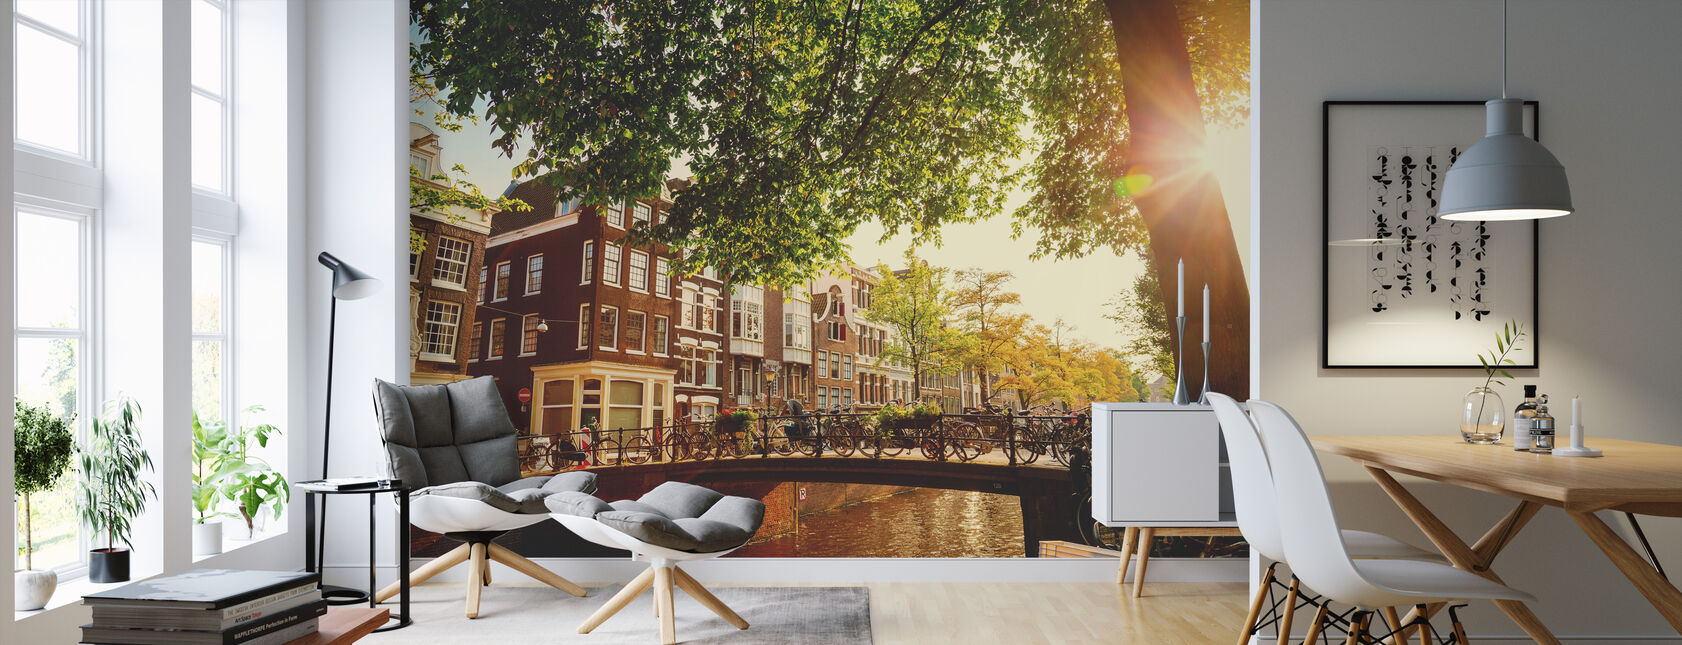 Bridge in Amsterdam - Wallpaper - Living Room